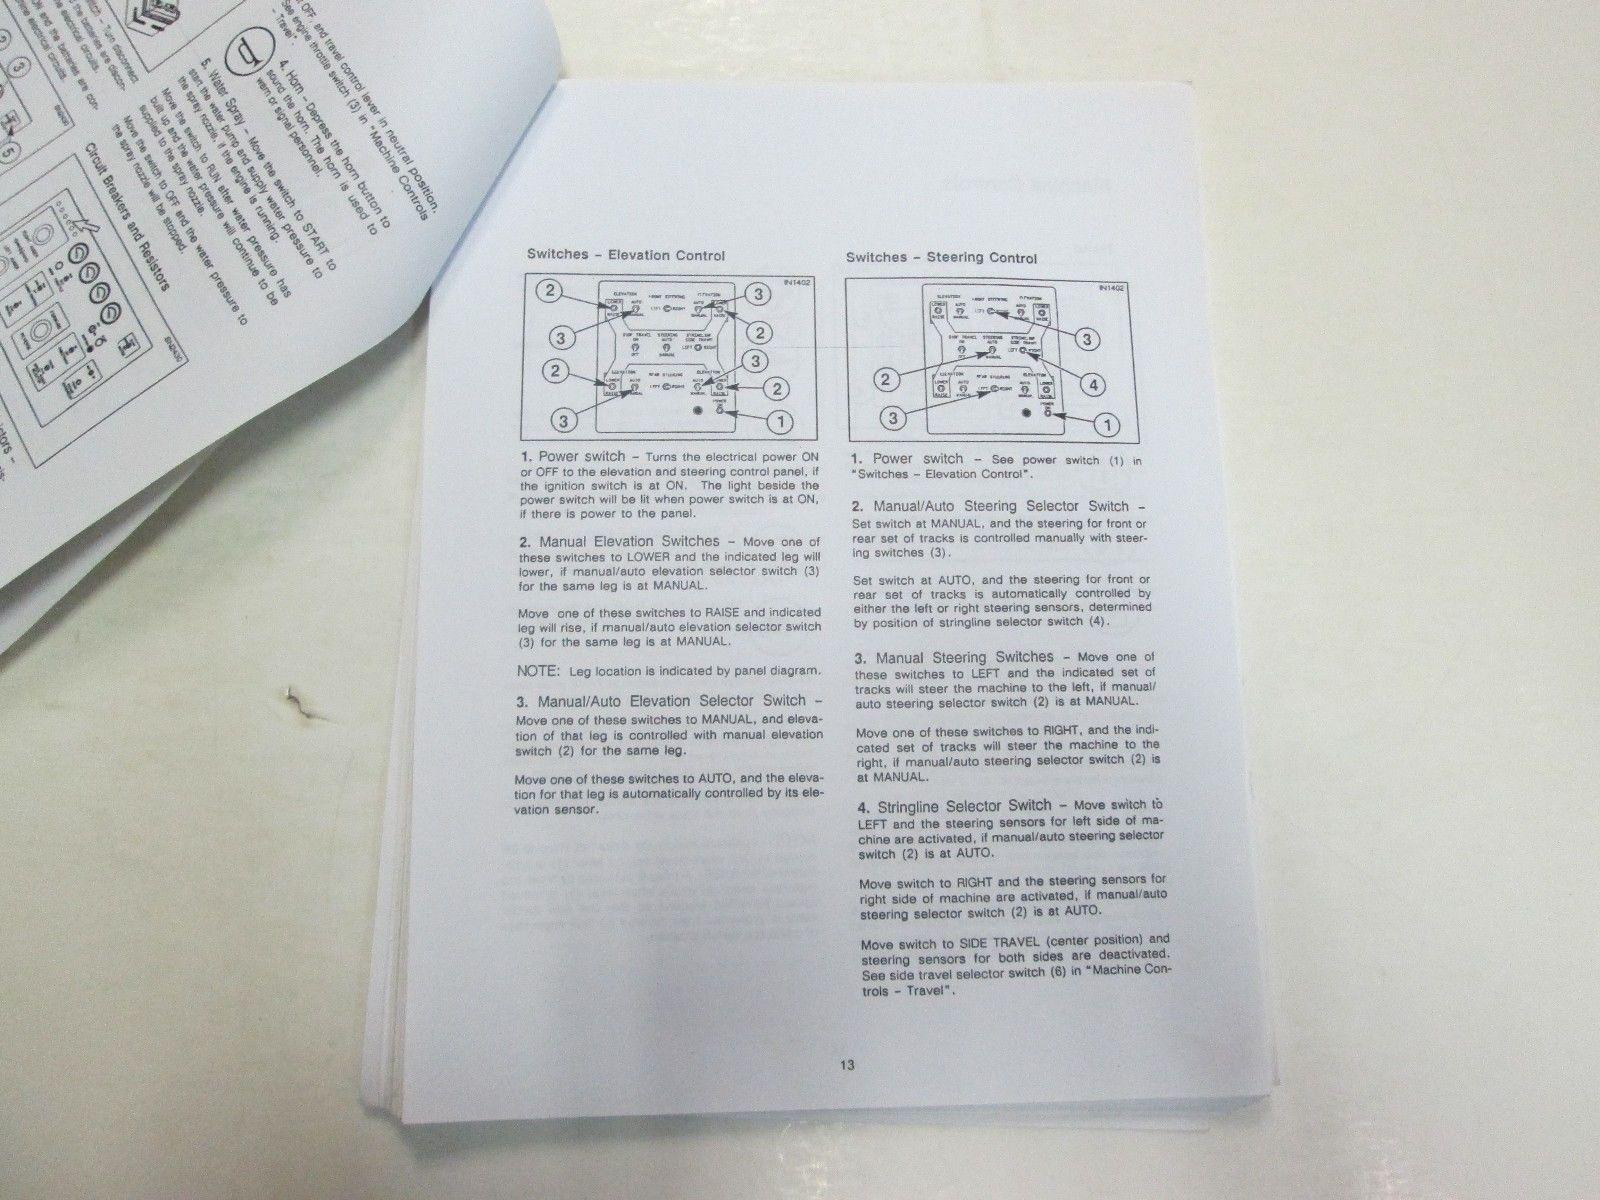 1990 CMI SF-350 Four Track Slipform Paver Operation & Maintenance Manual STAINS